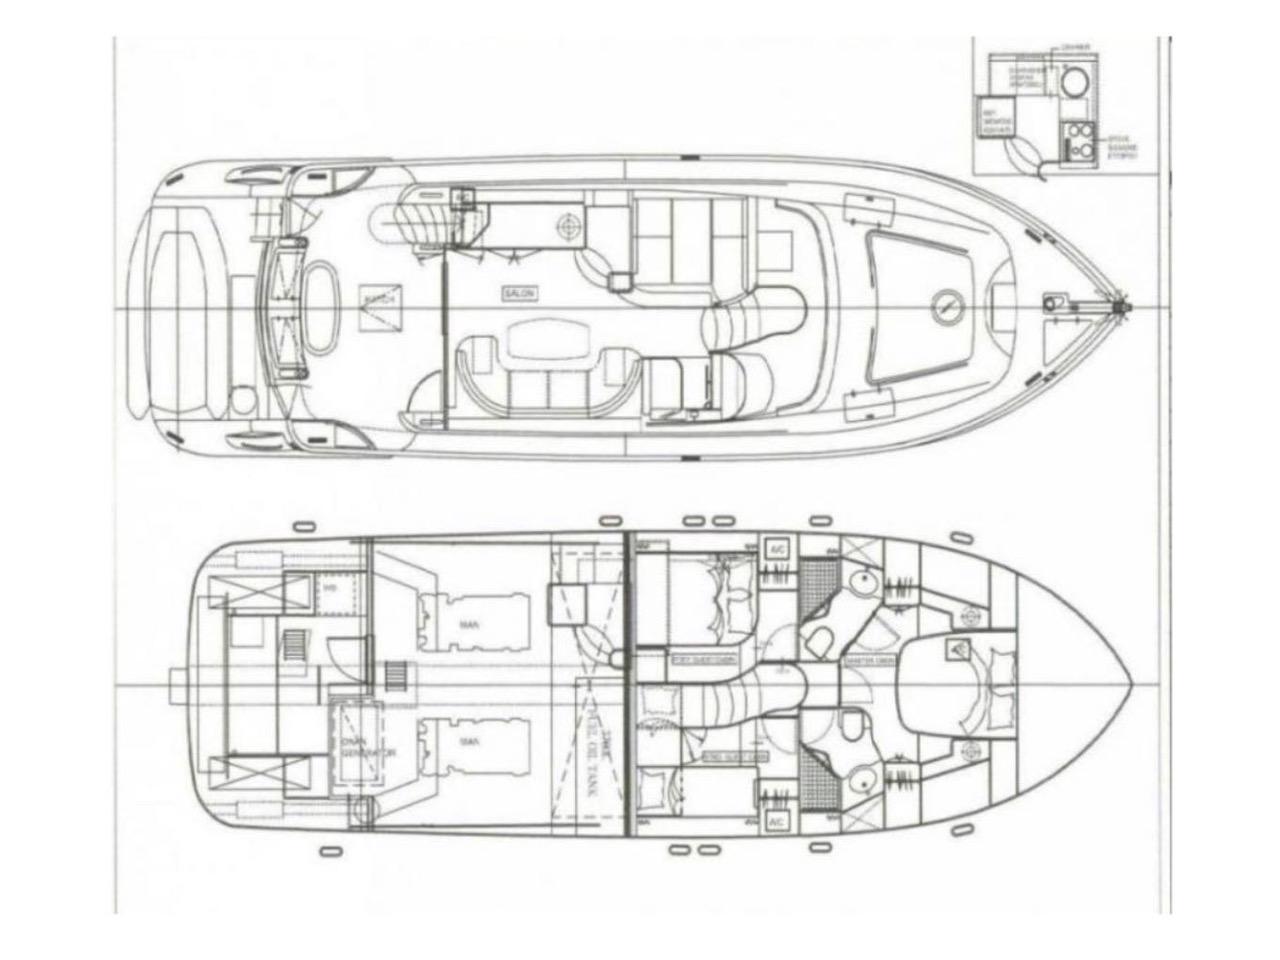 Elegance-Yachts-54-1